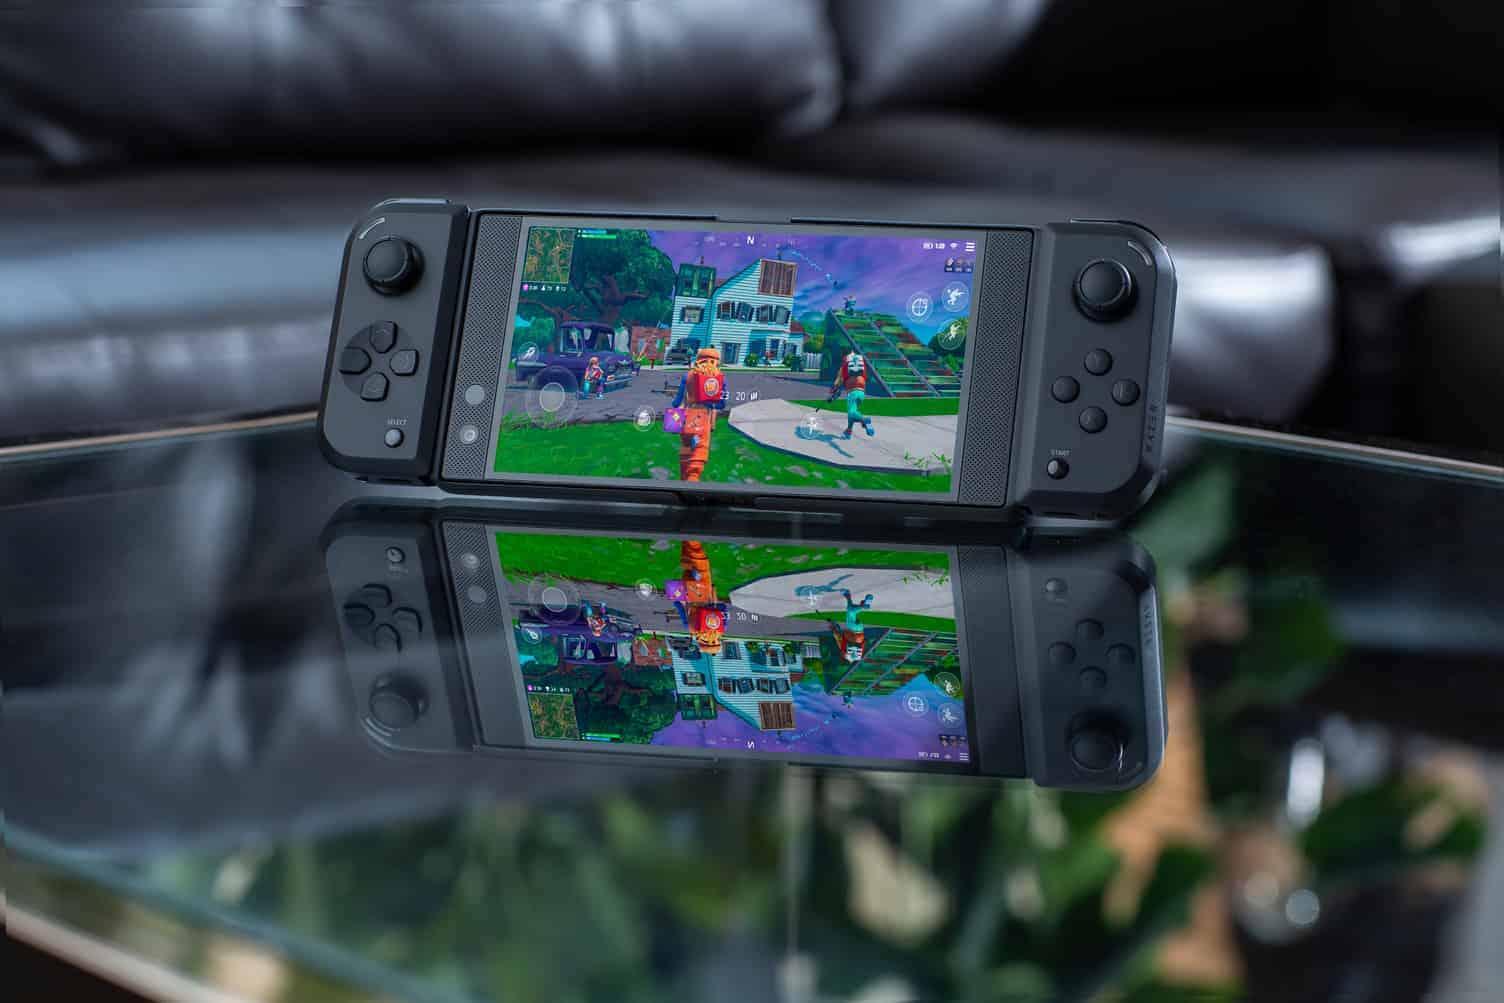 Razer Junglecat Mobile Game Controller 4